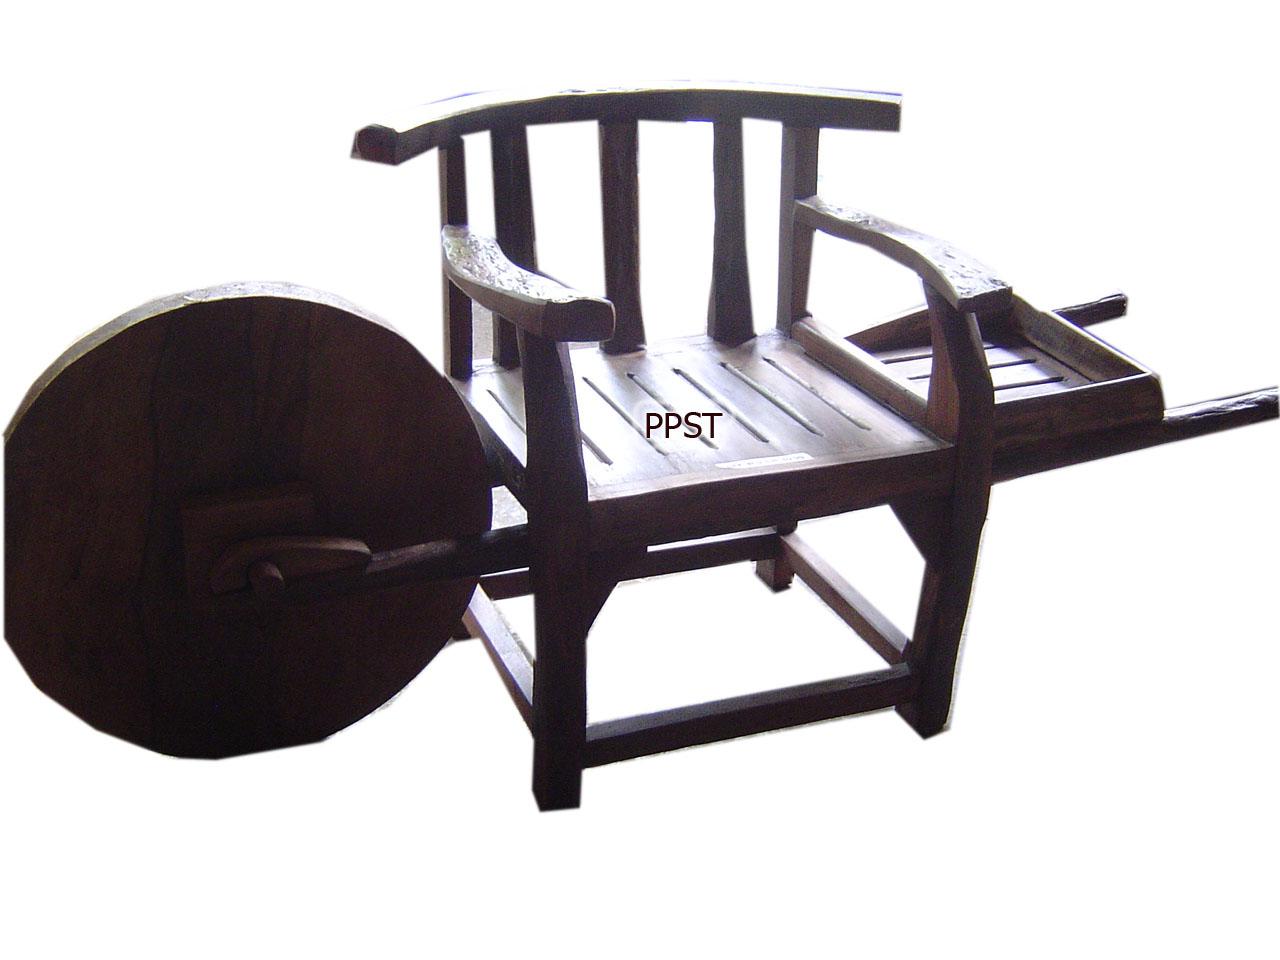 Antique Chair-sn093-2